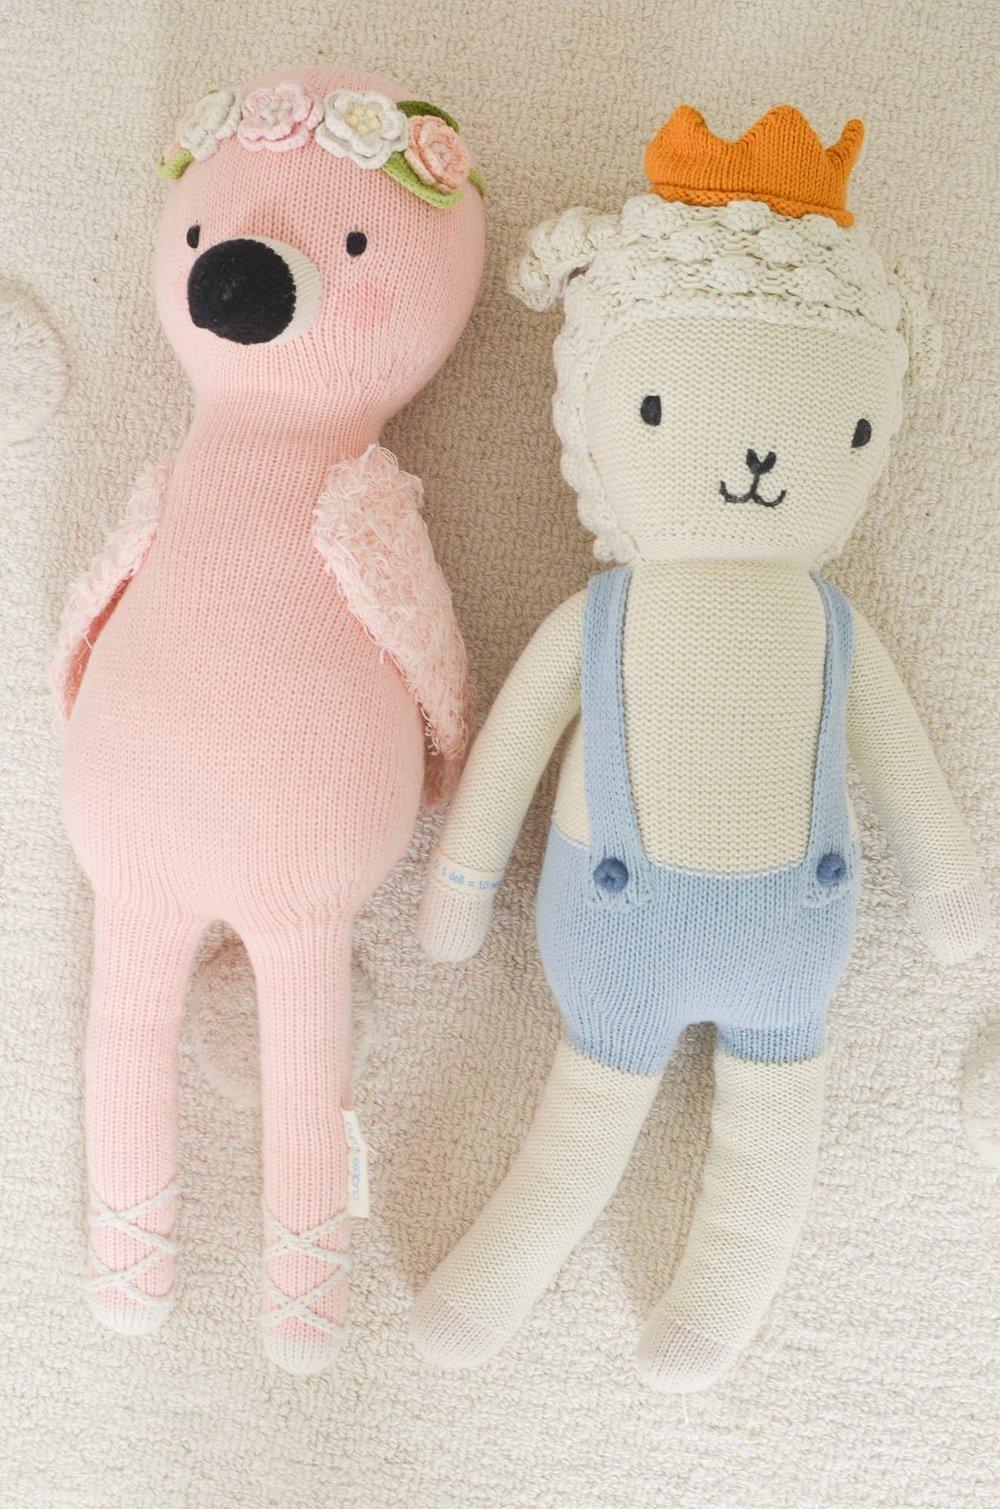 Keepsake Gifts for Toddler Easter Baskets | Momma Society